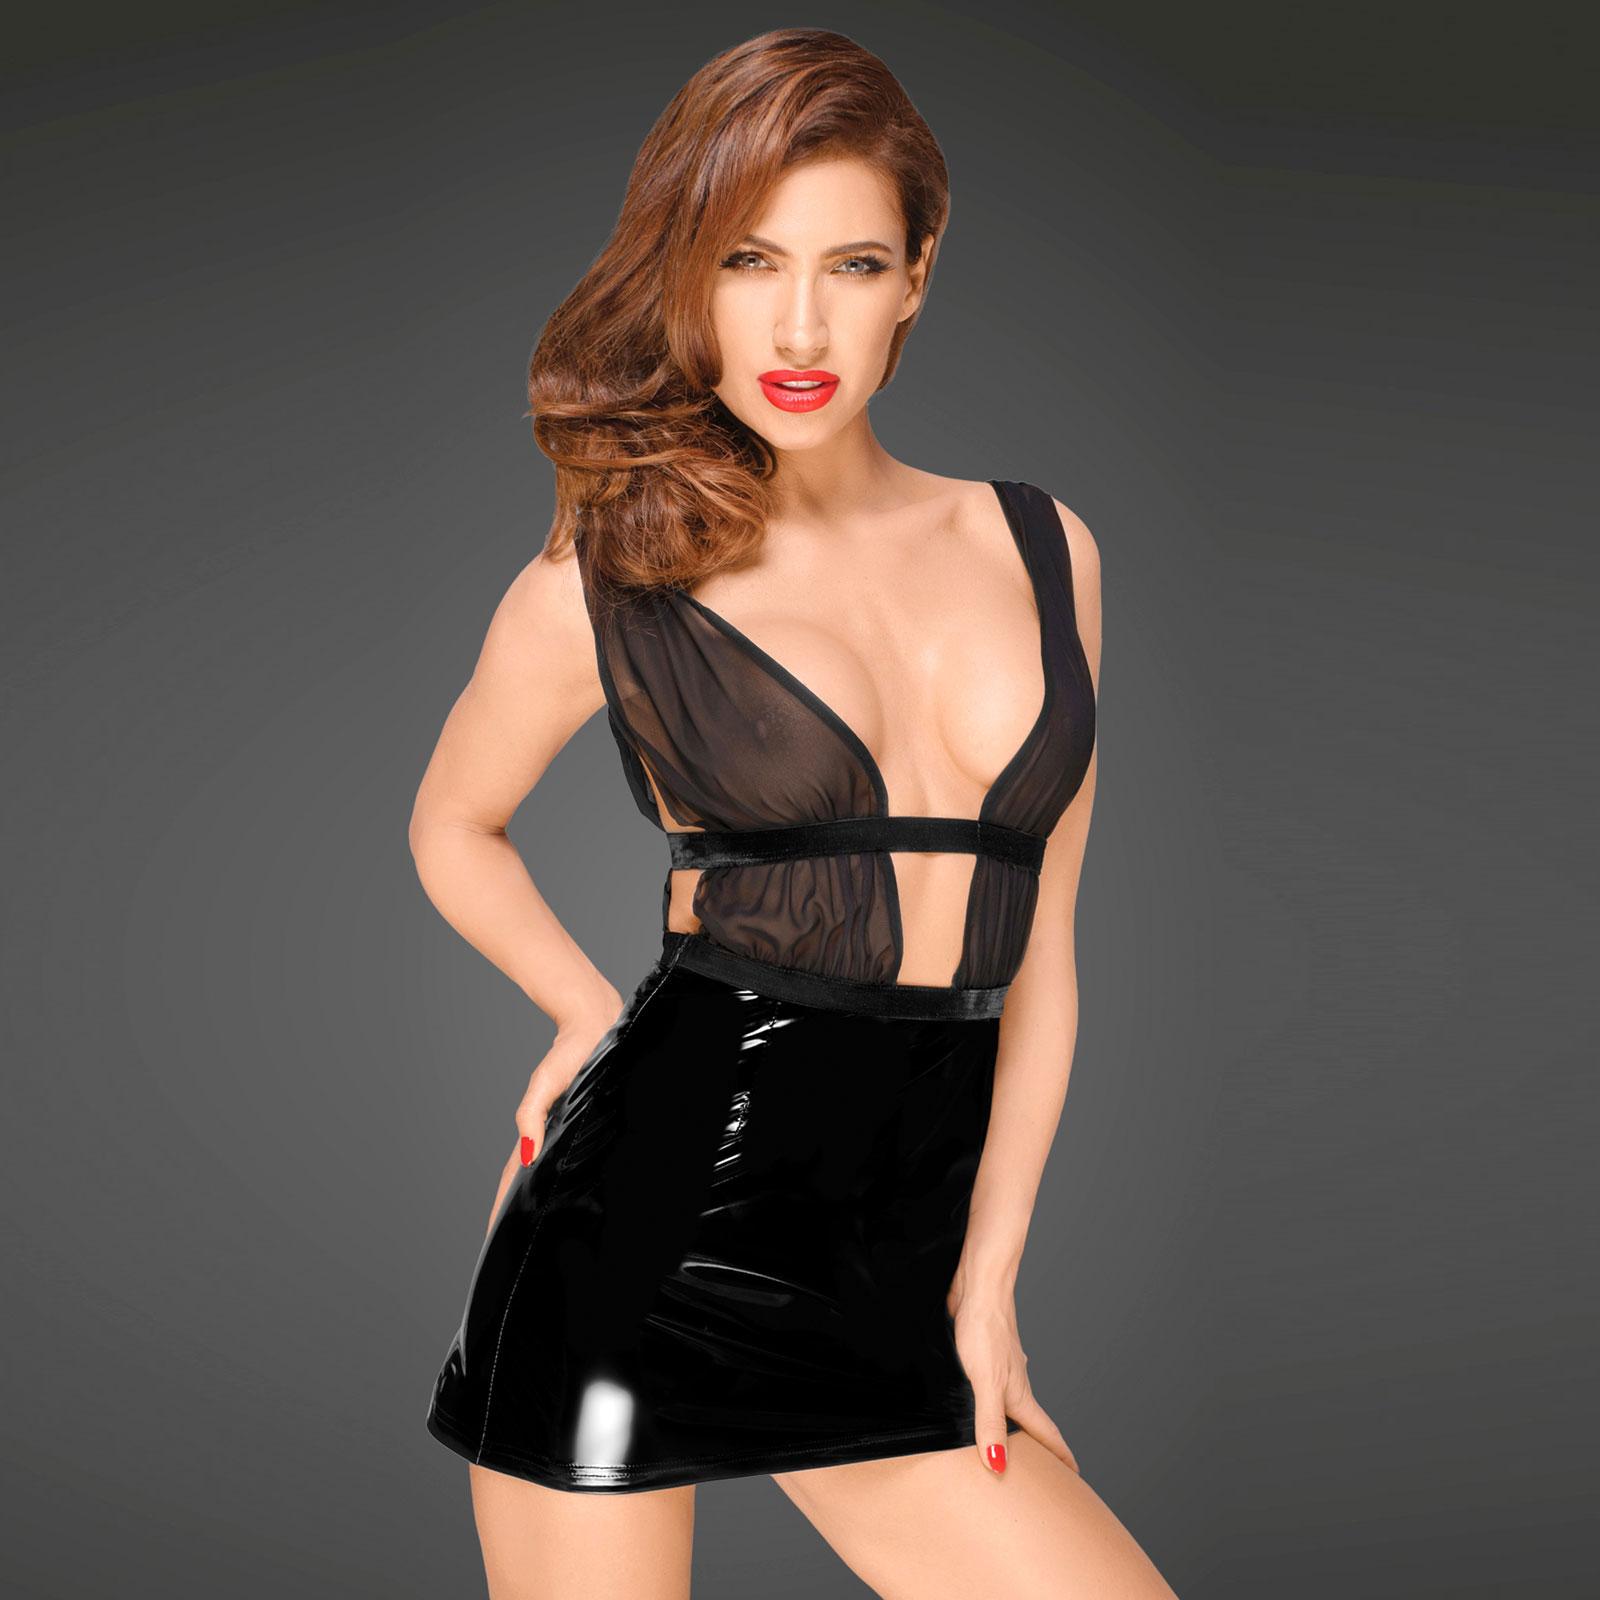 NOIR HANDMADE PVC Mini Dress With Tulle Top